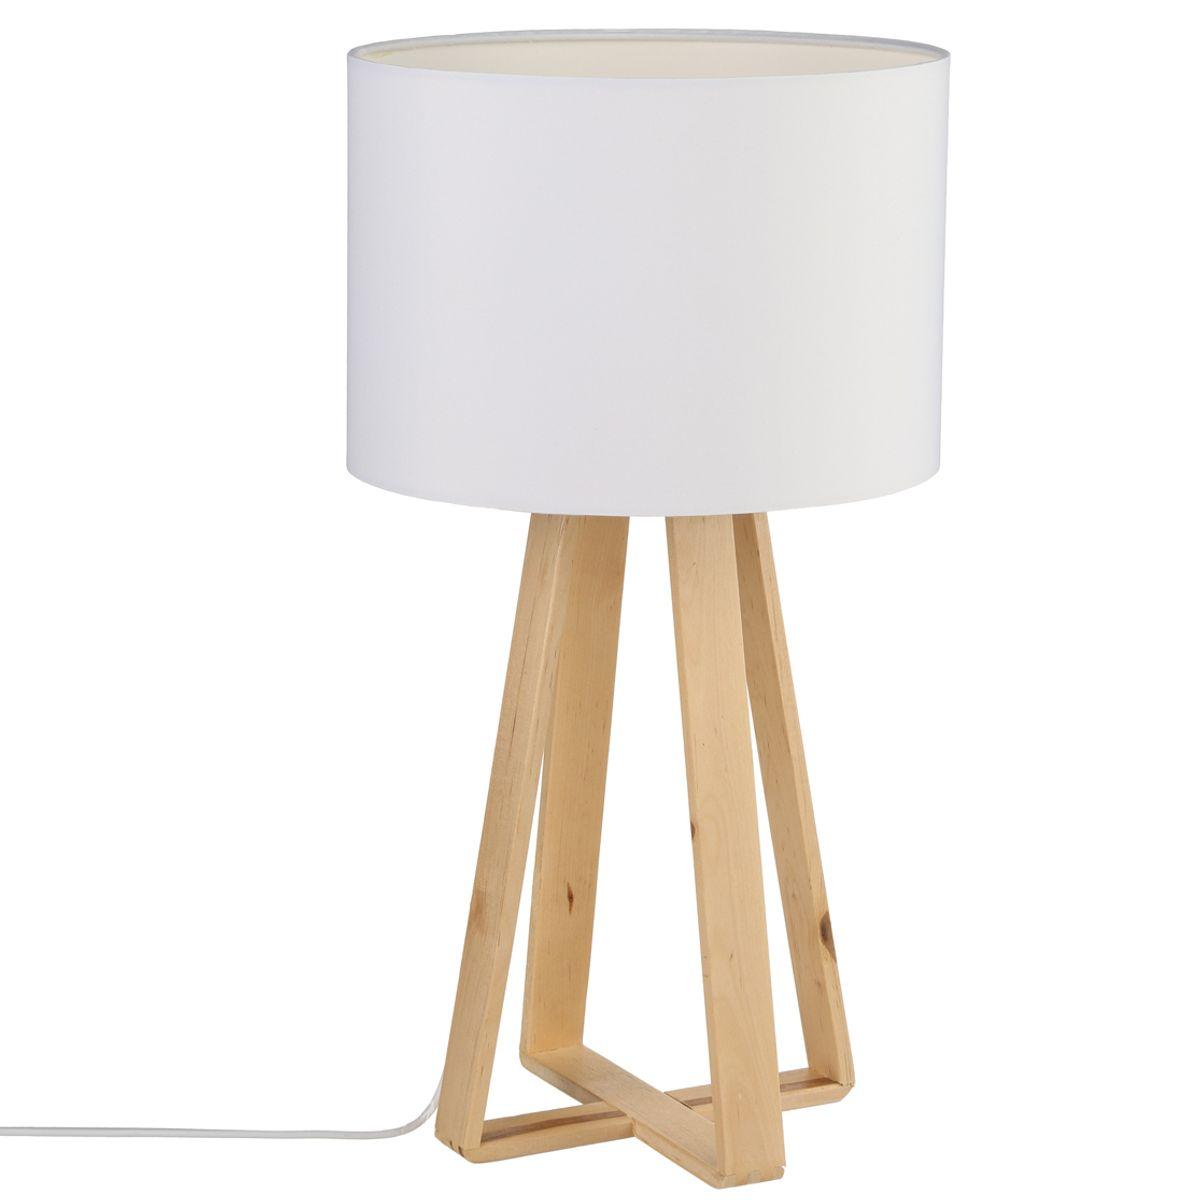 Lampe pied bois Scandi blanc